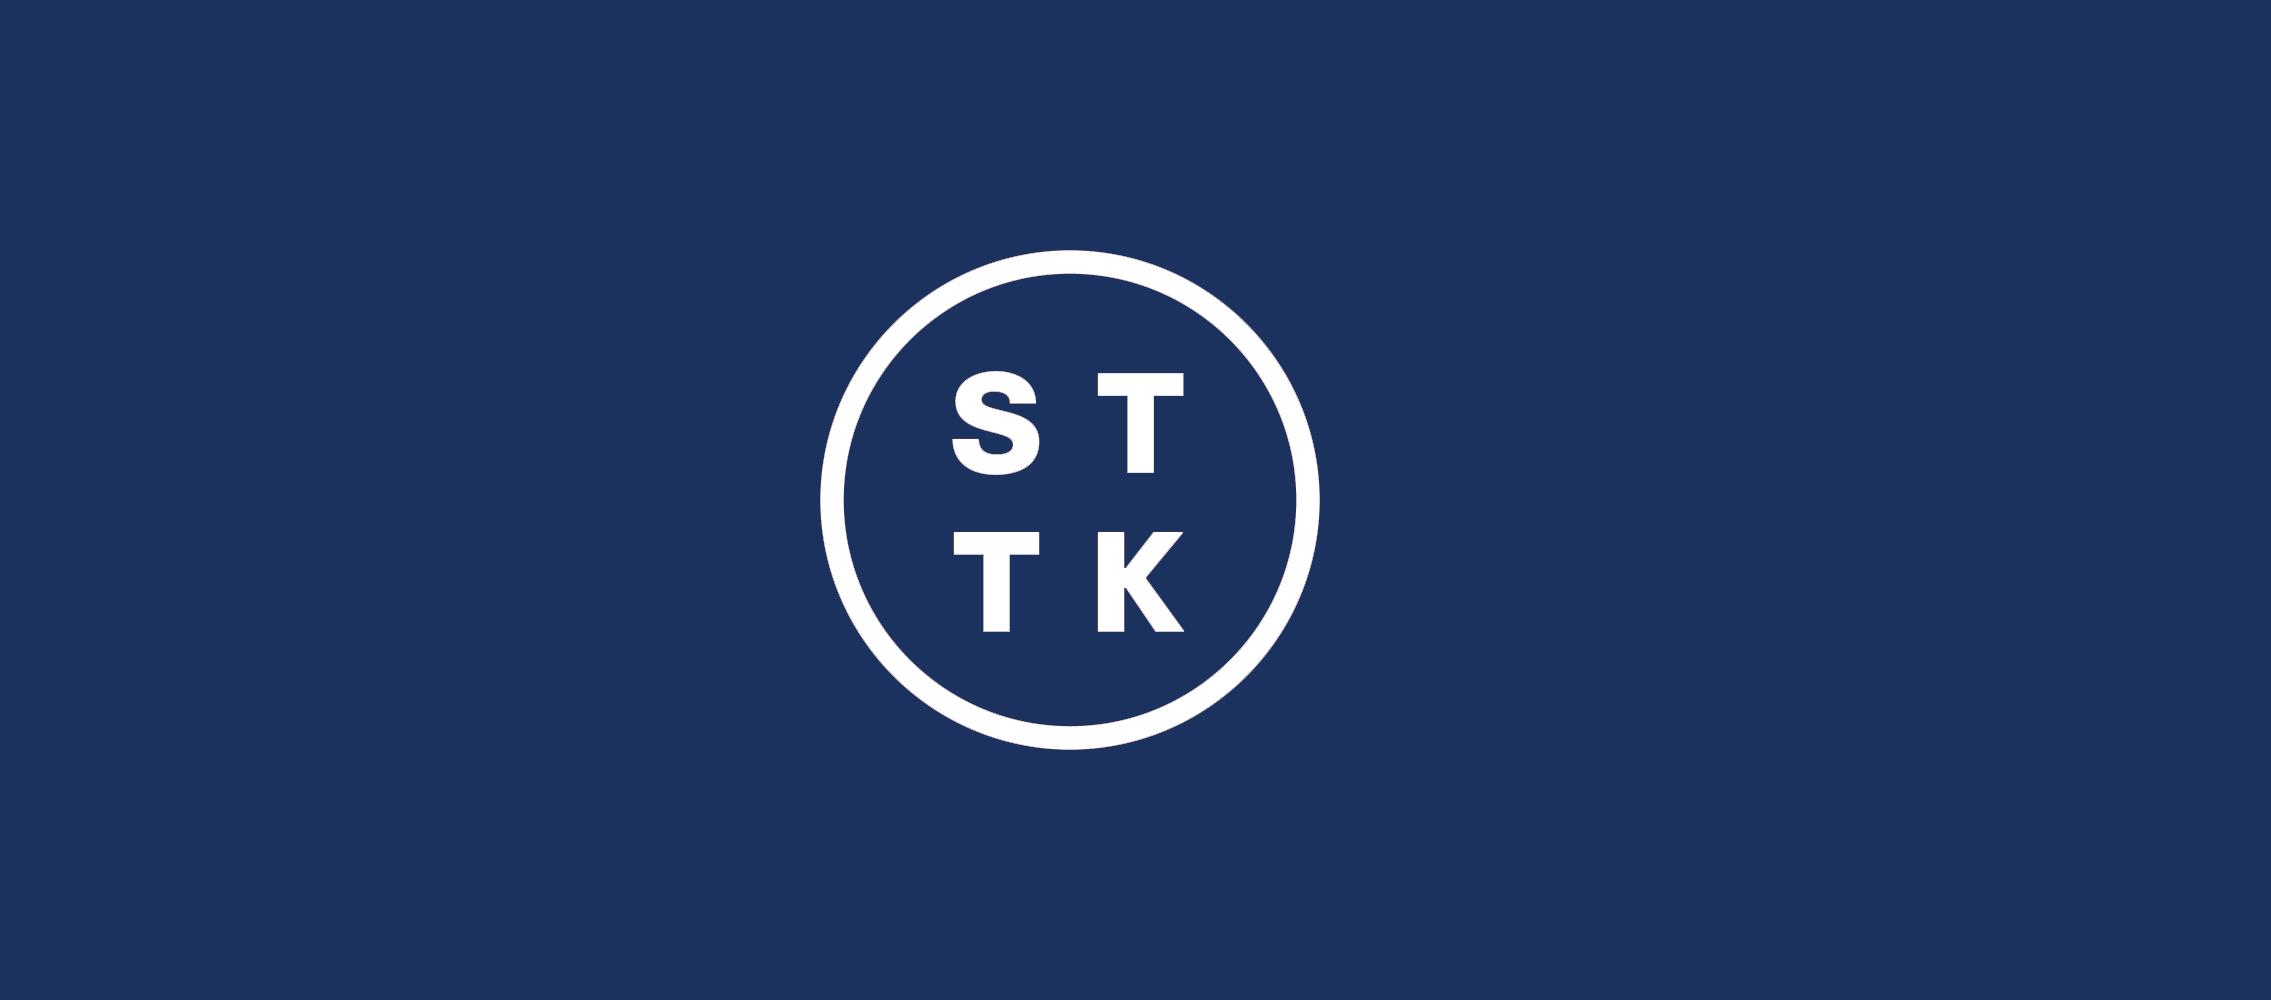 STTK:n logo